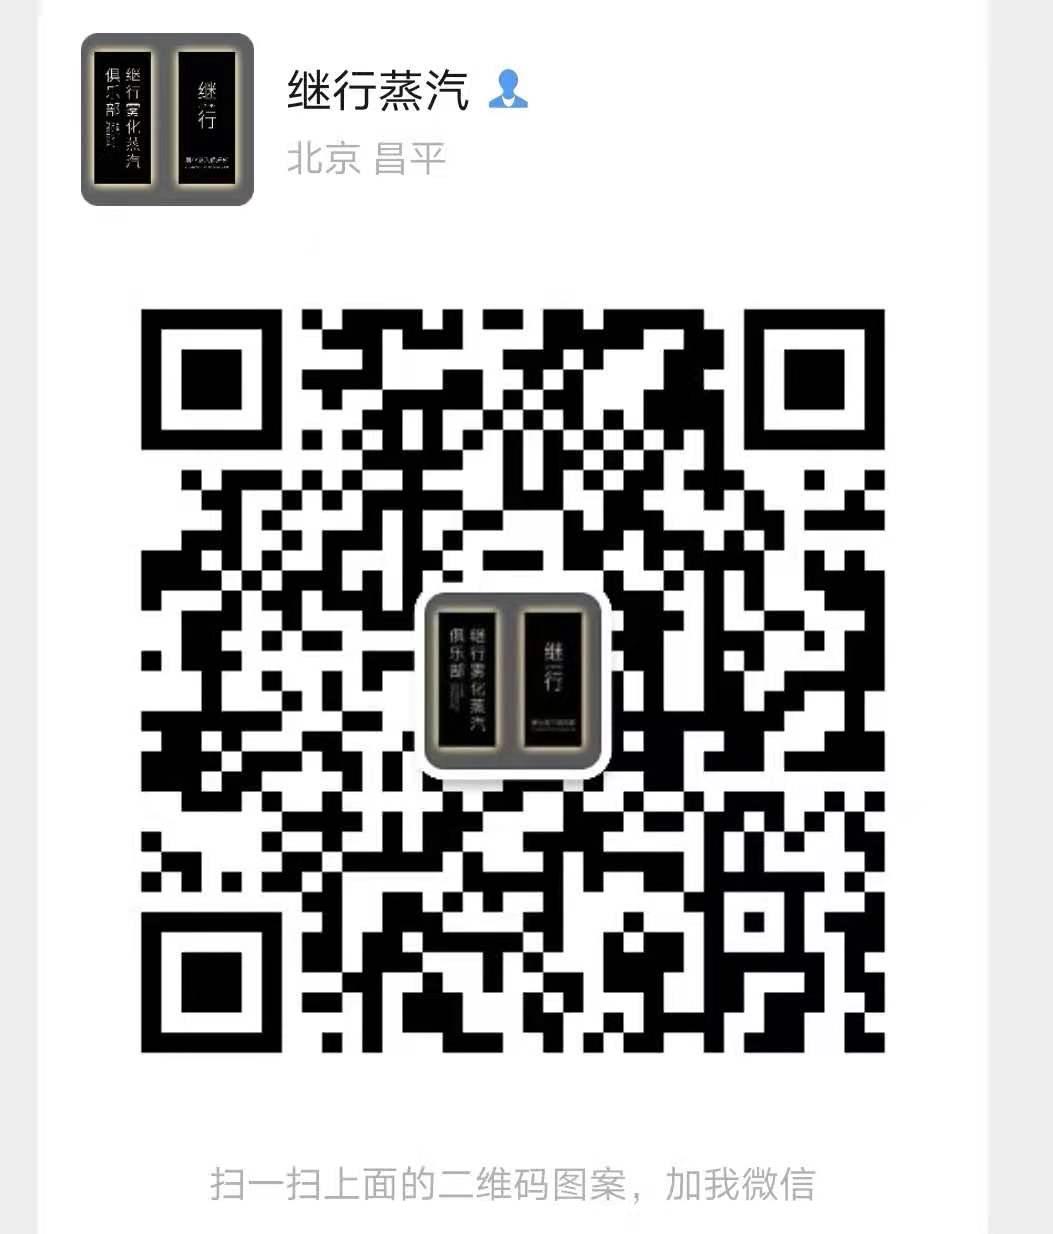 【LVLUO】绿萝二代电子烟代理价格表有吗,好做吗,继行蒸汽LVLUO官方品牌商